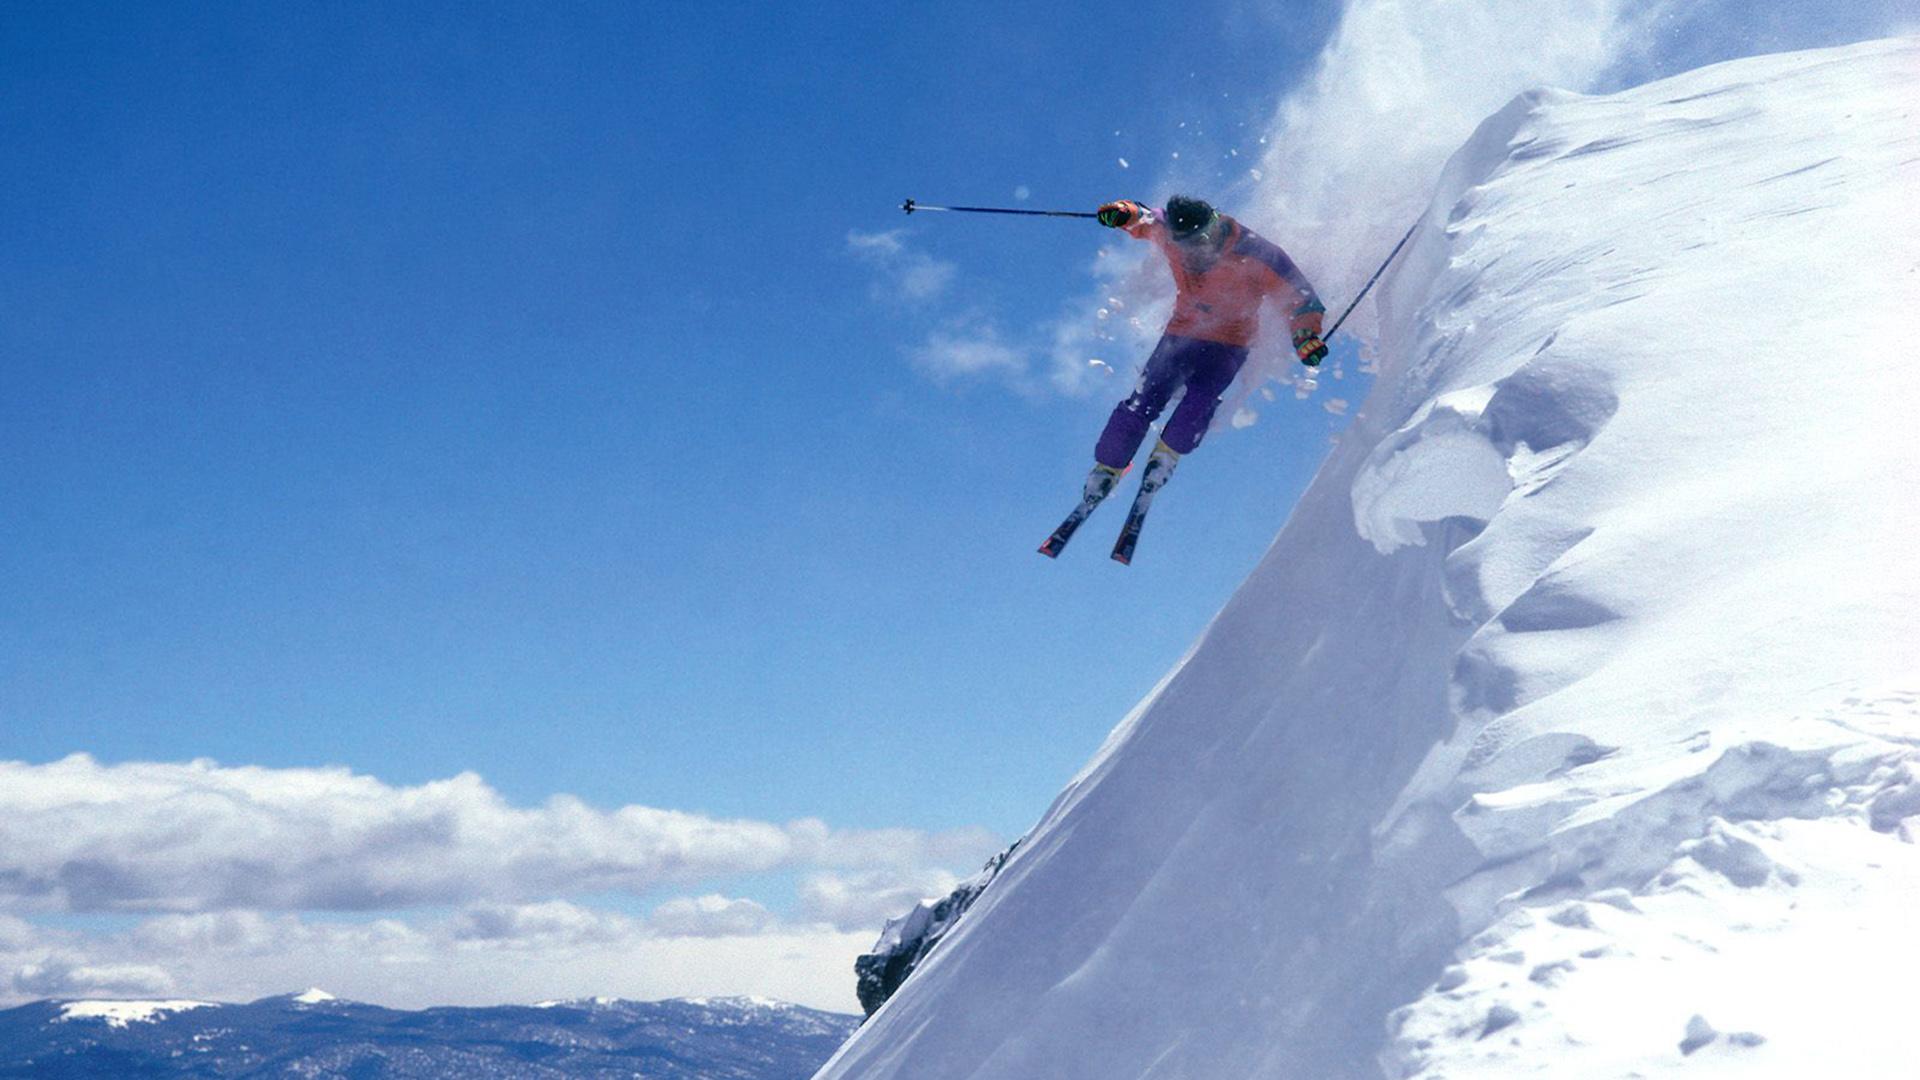 Wallpaper de ski xtremo